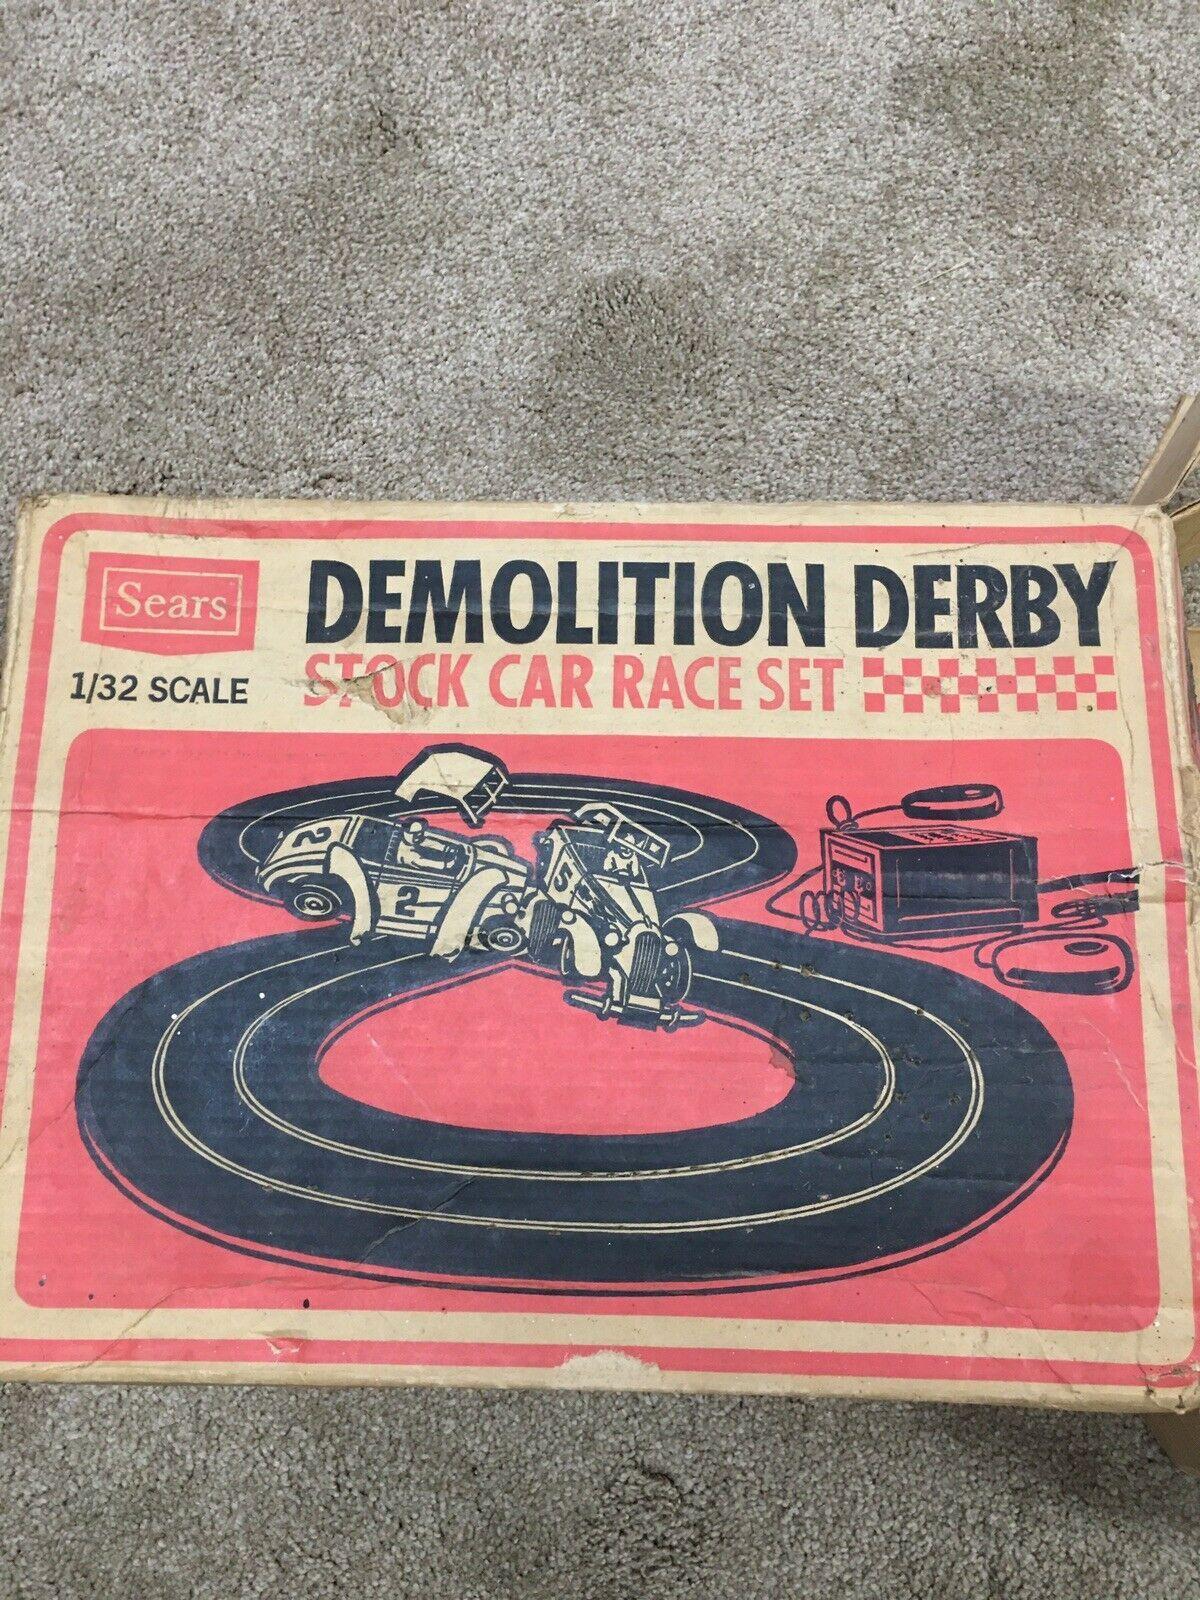 Demolition Derby Sears Roebuck Stock Car Race Set 1/32 Scale Extra Aurora Track - $58.41